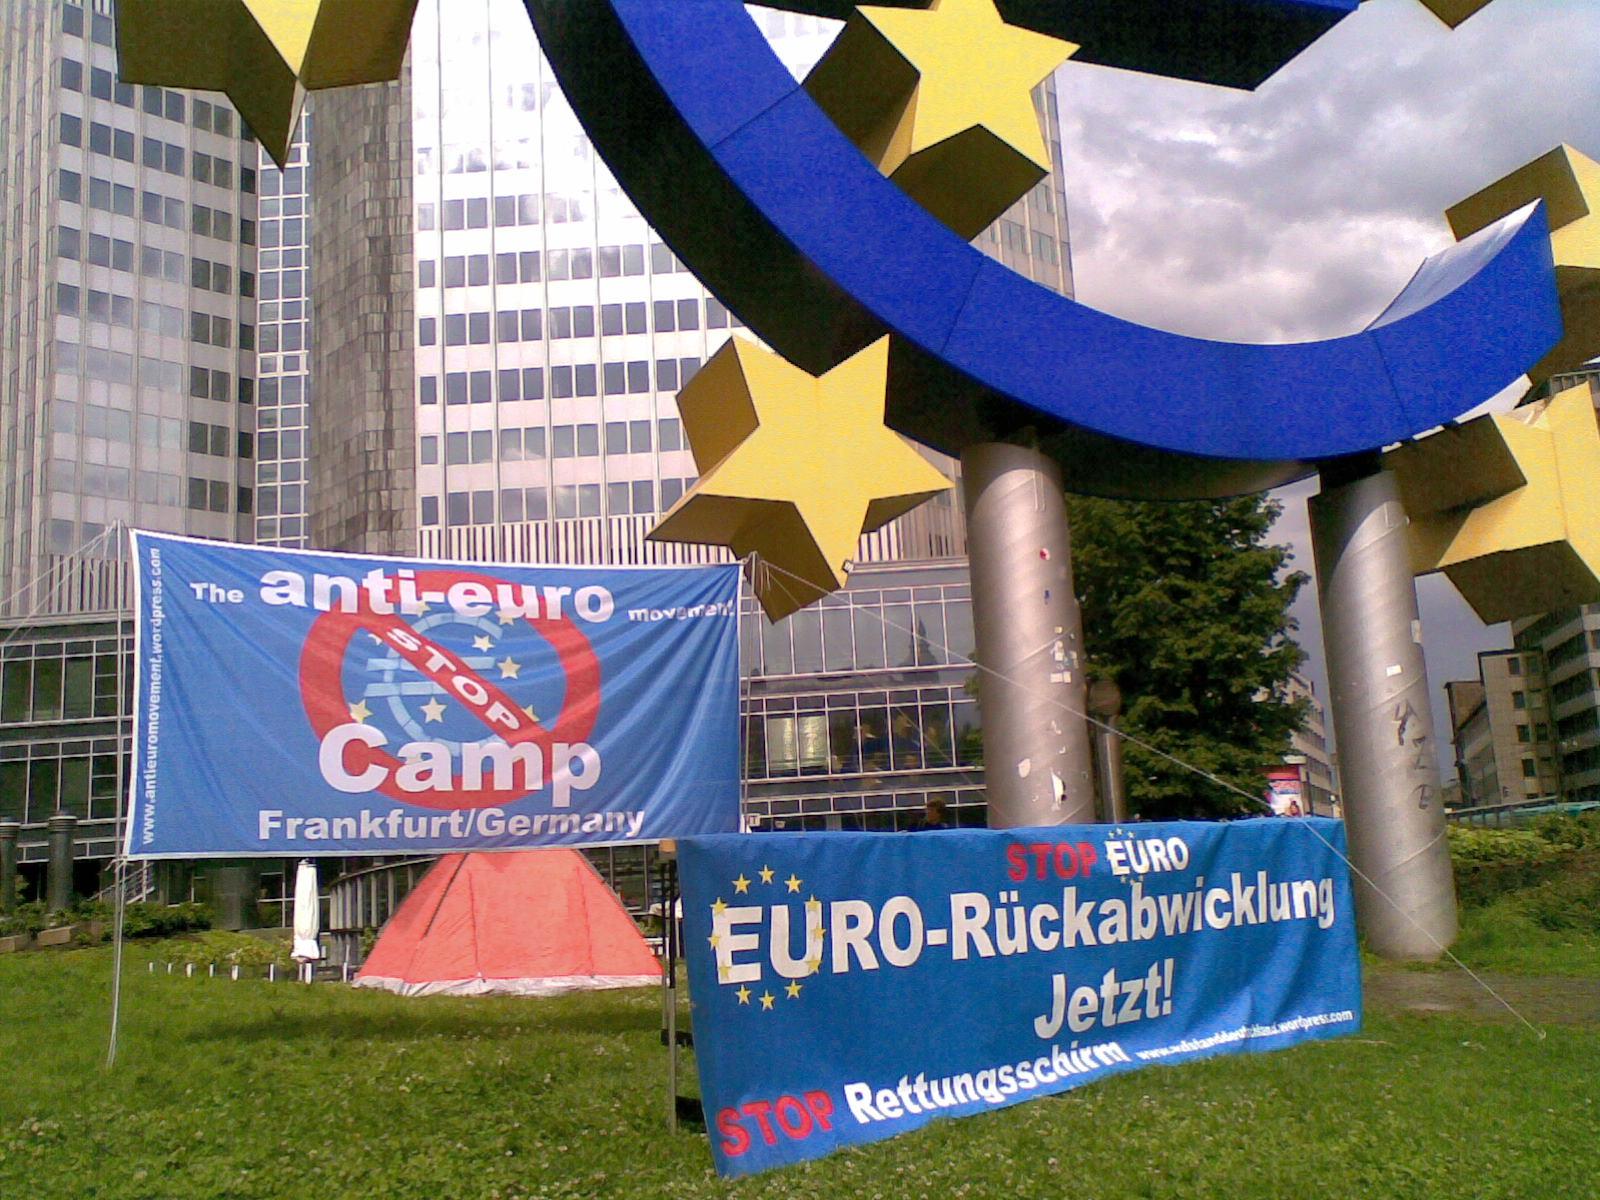 anti-euro-camp-frankfurt-germany[1].jpg